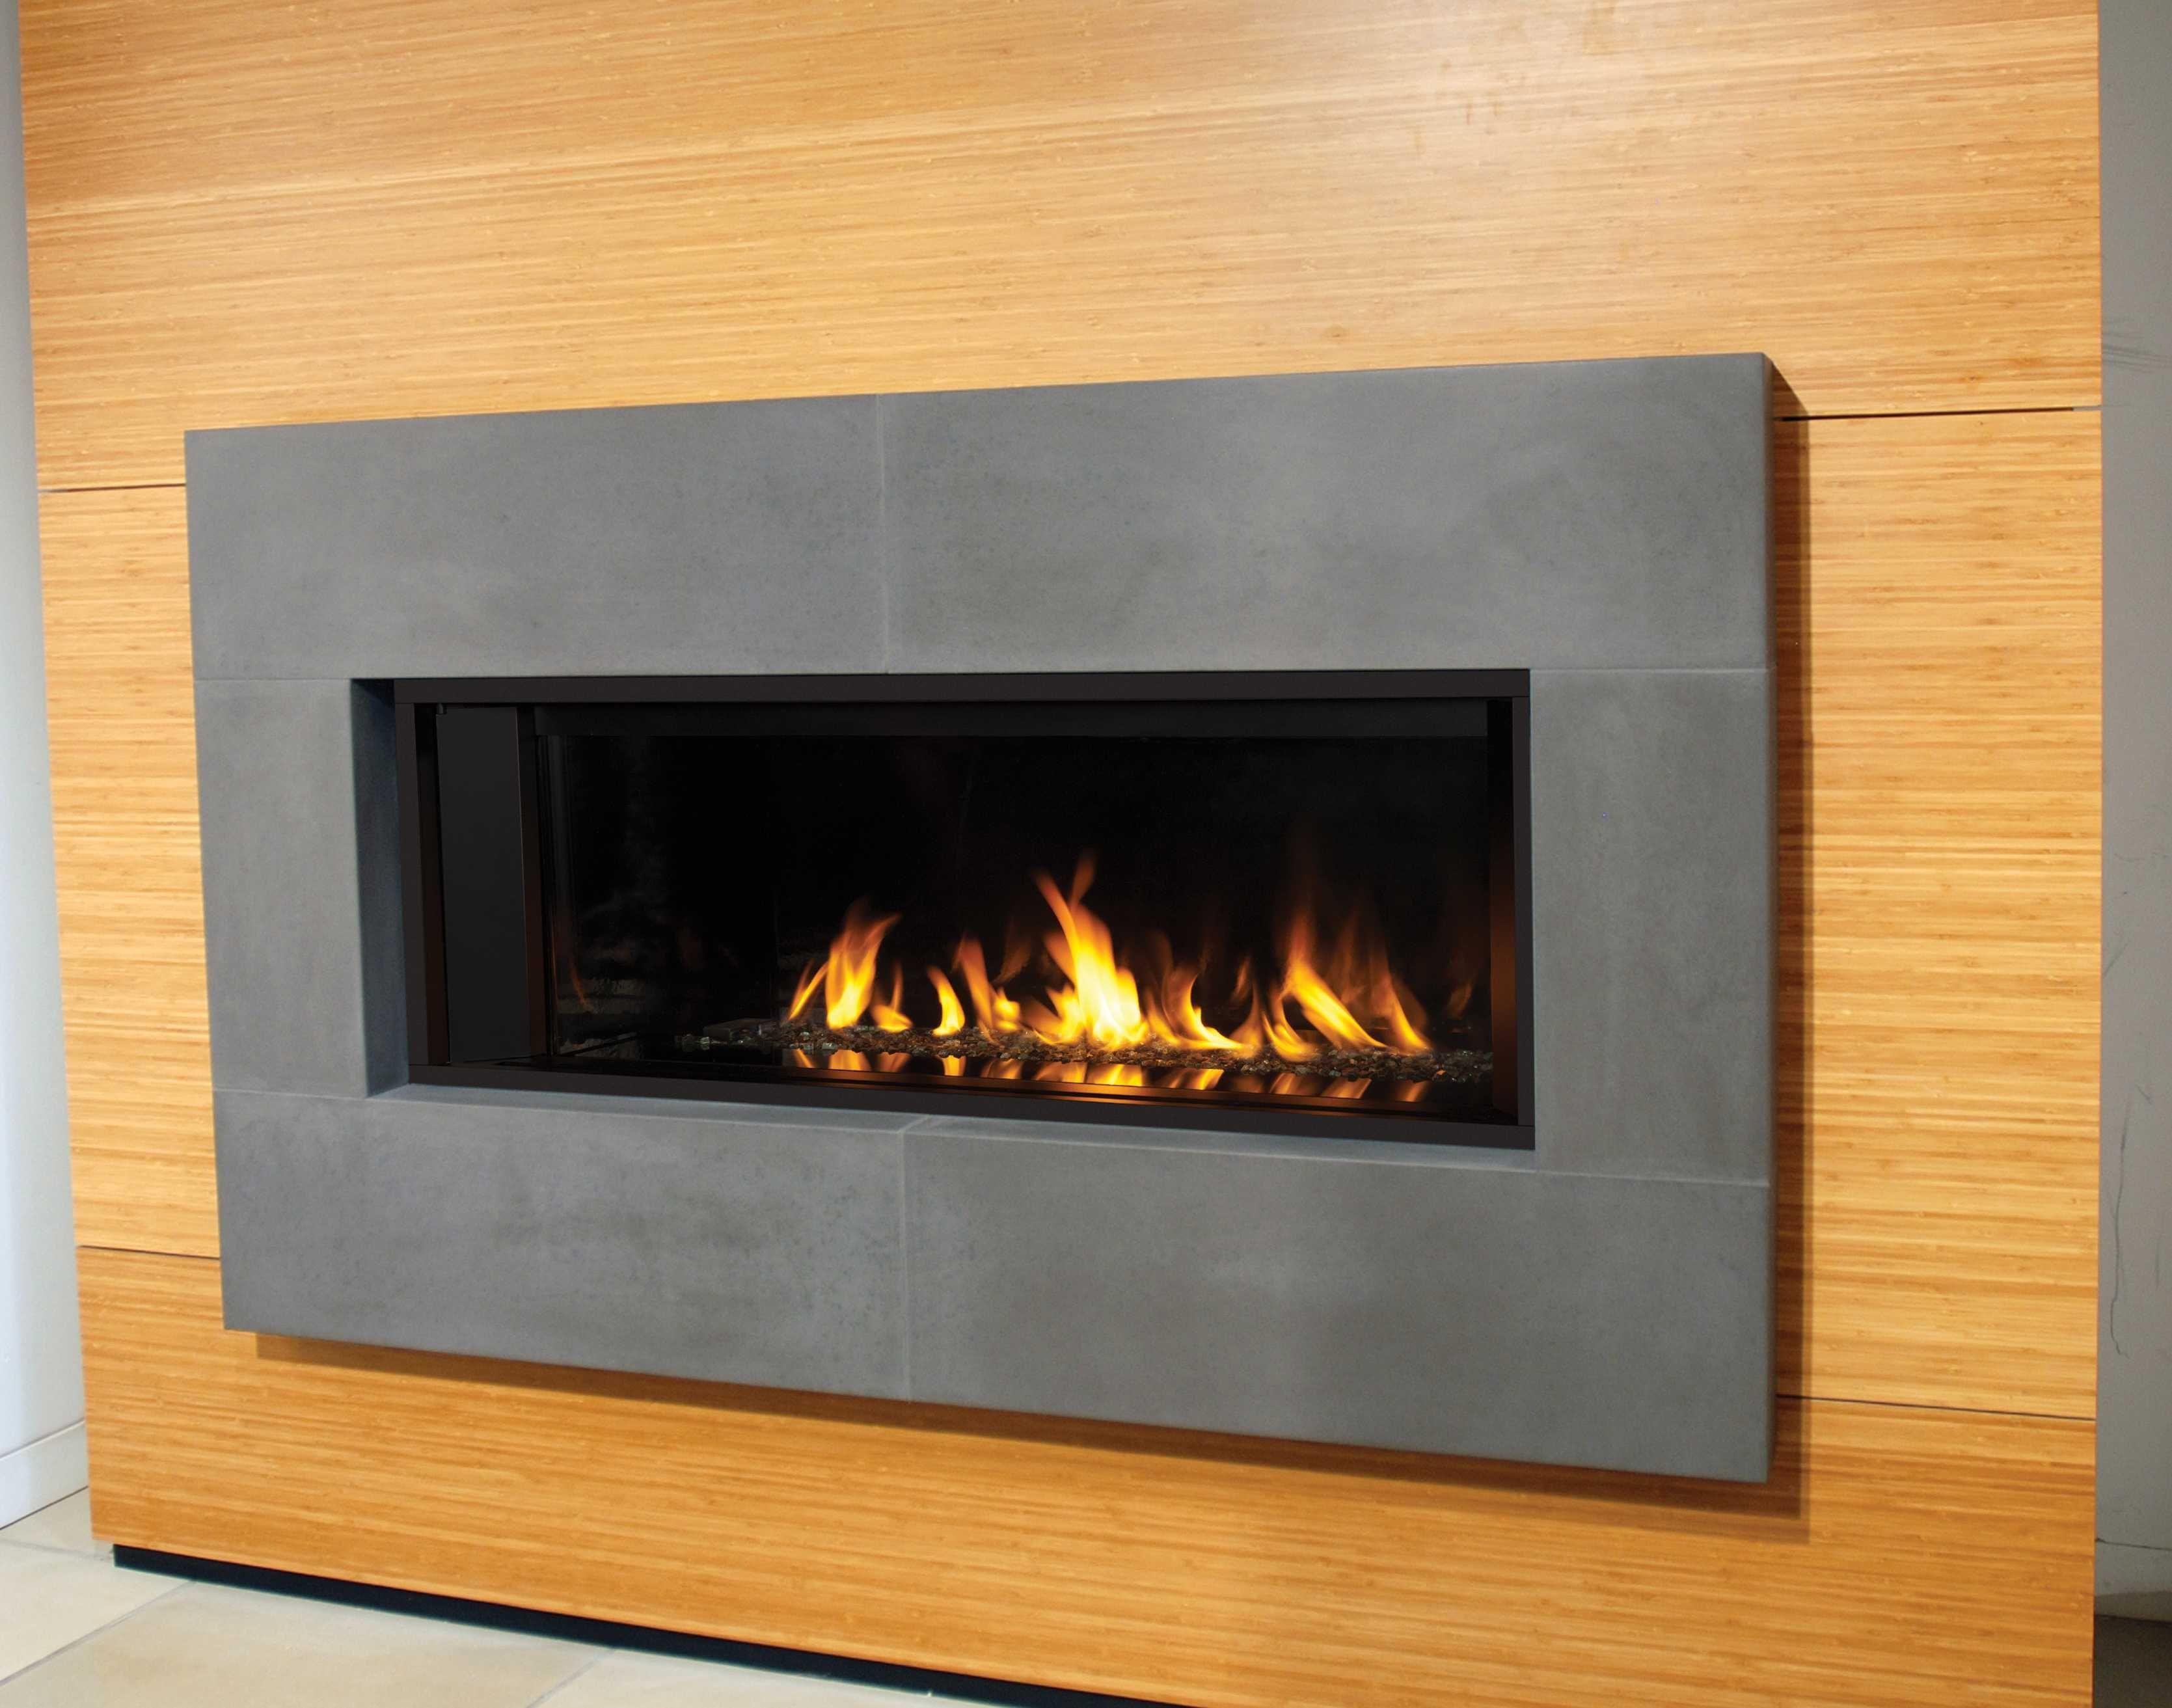 Valor Gas Fireplaces Valor Fireplaces Gas Fireplace Linear